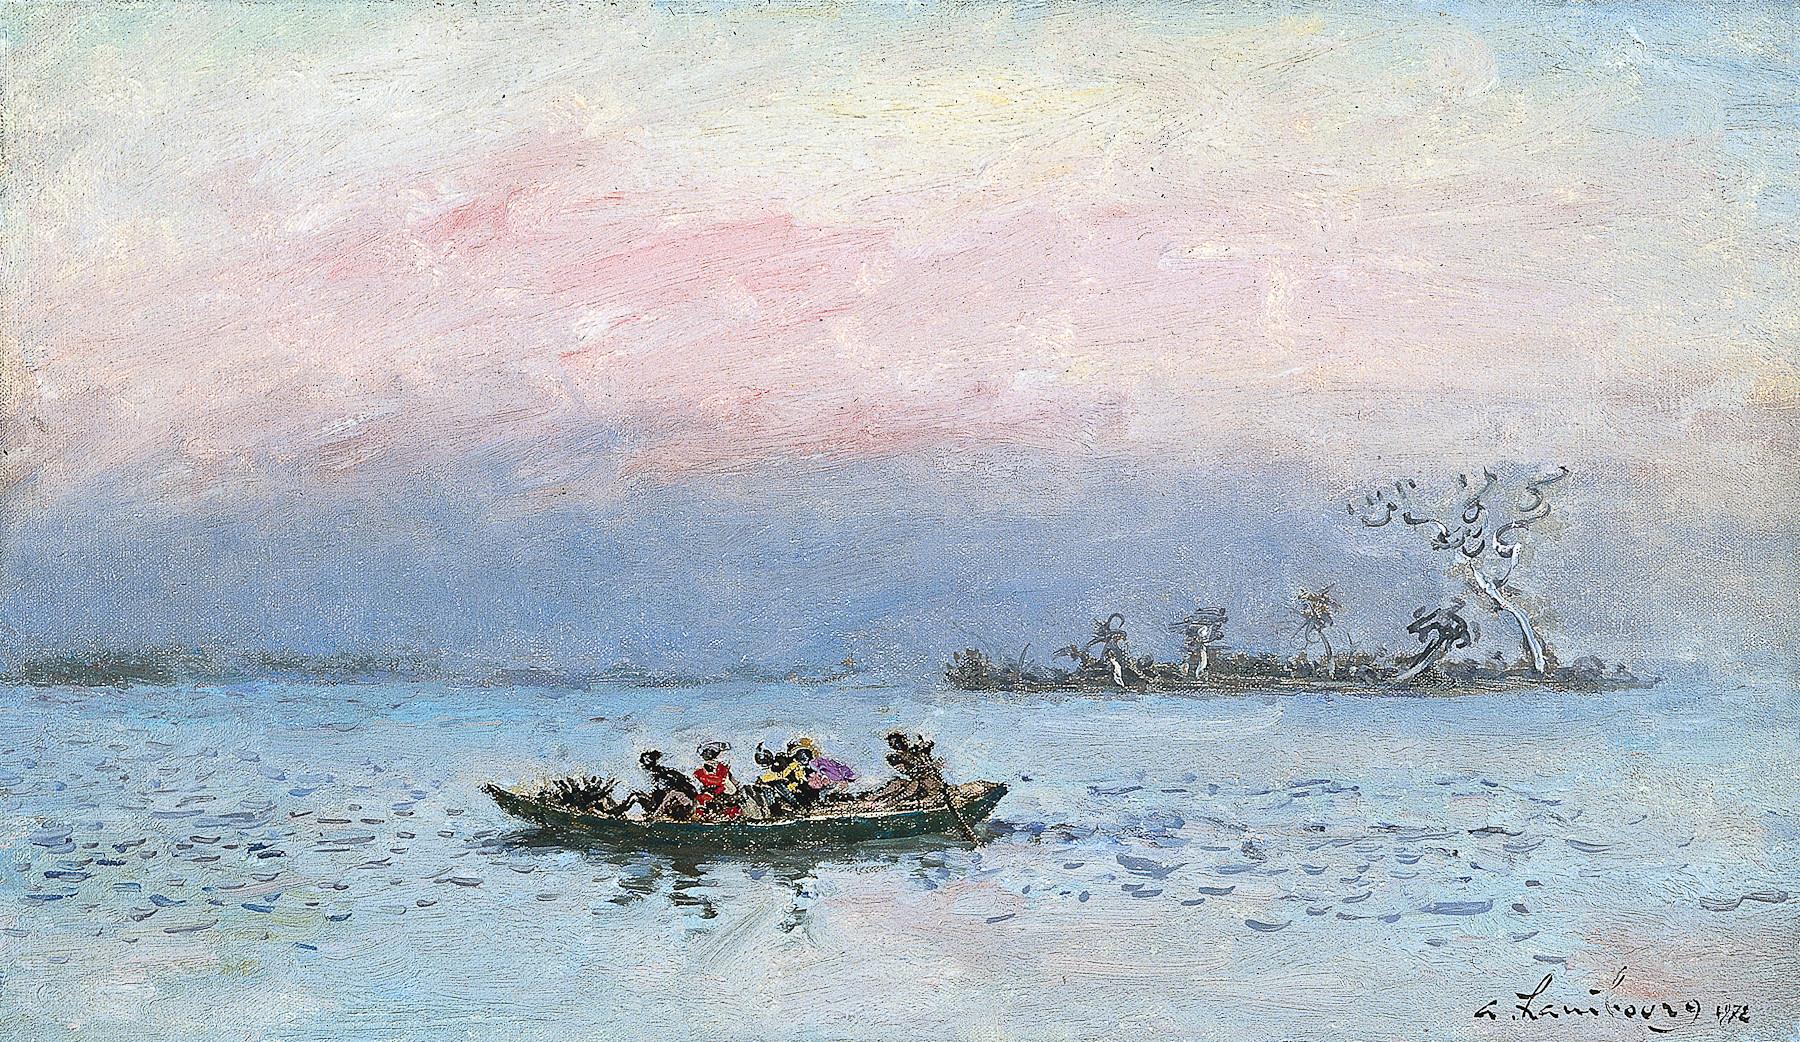 «Sur la Lagune vers Abidjan l'après-midi, l'heure rose» 1972, 27cmx46cm, CI45